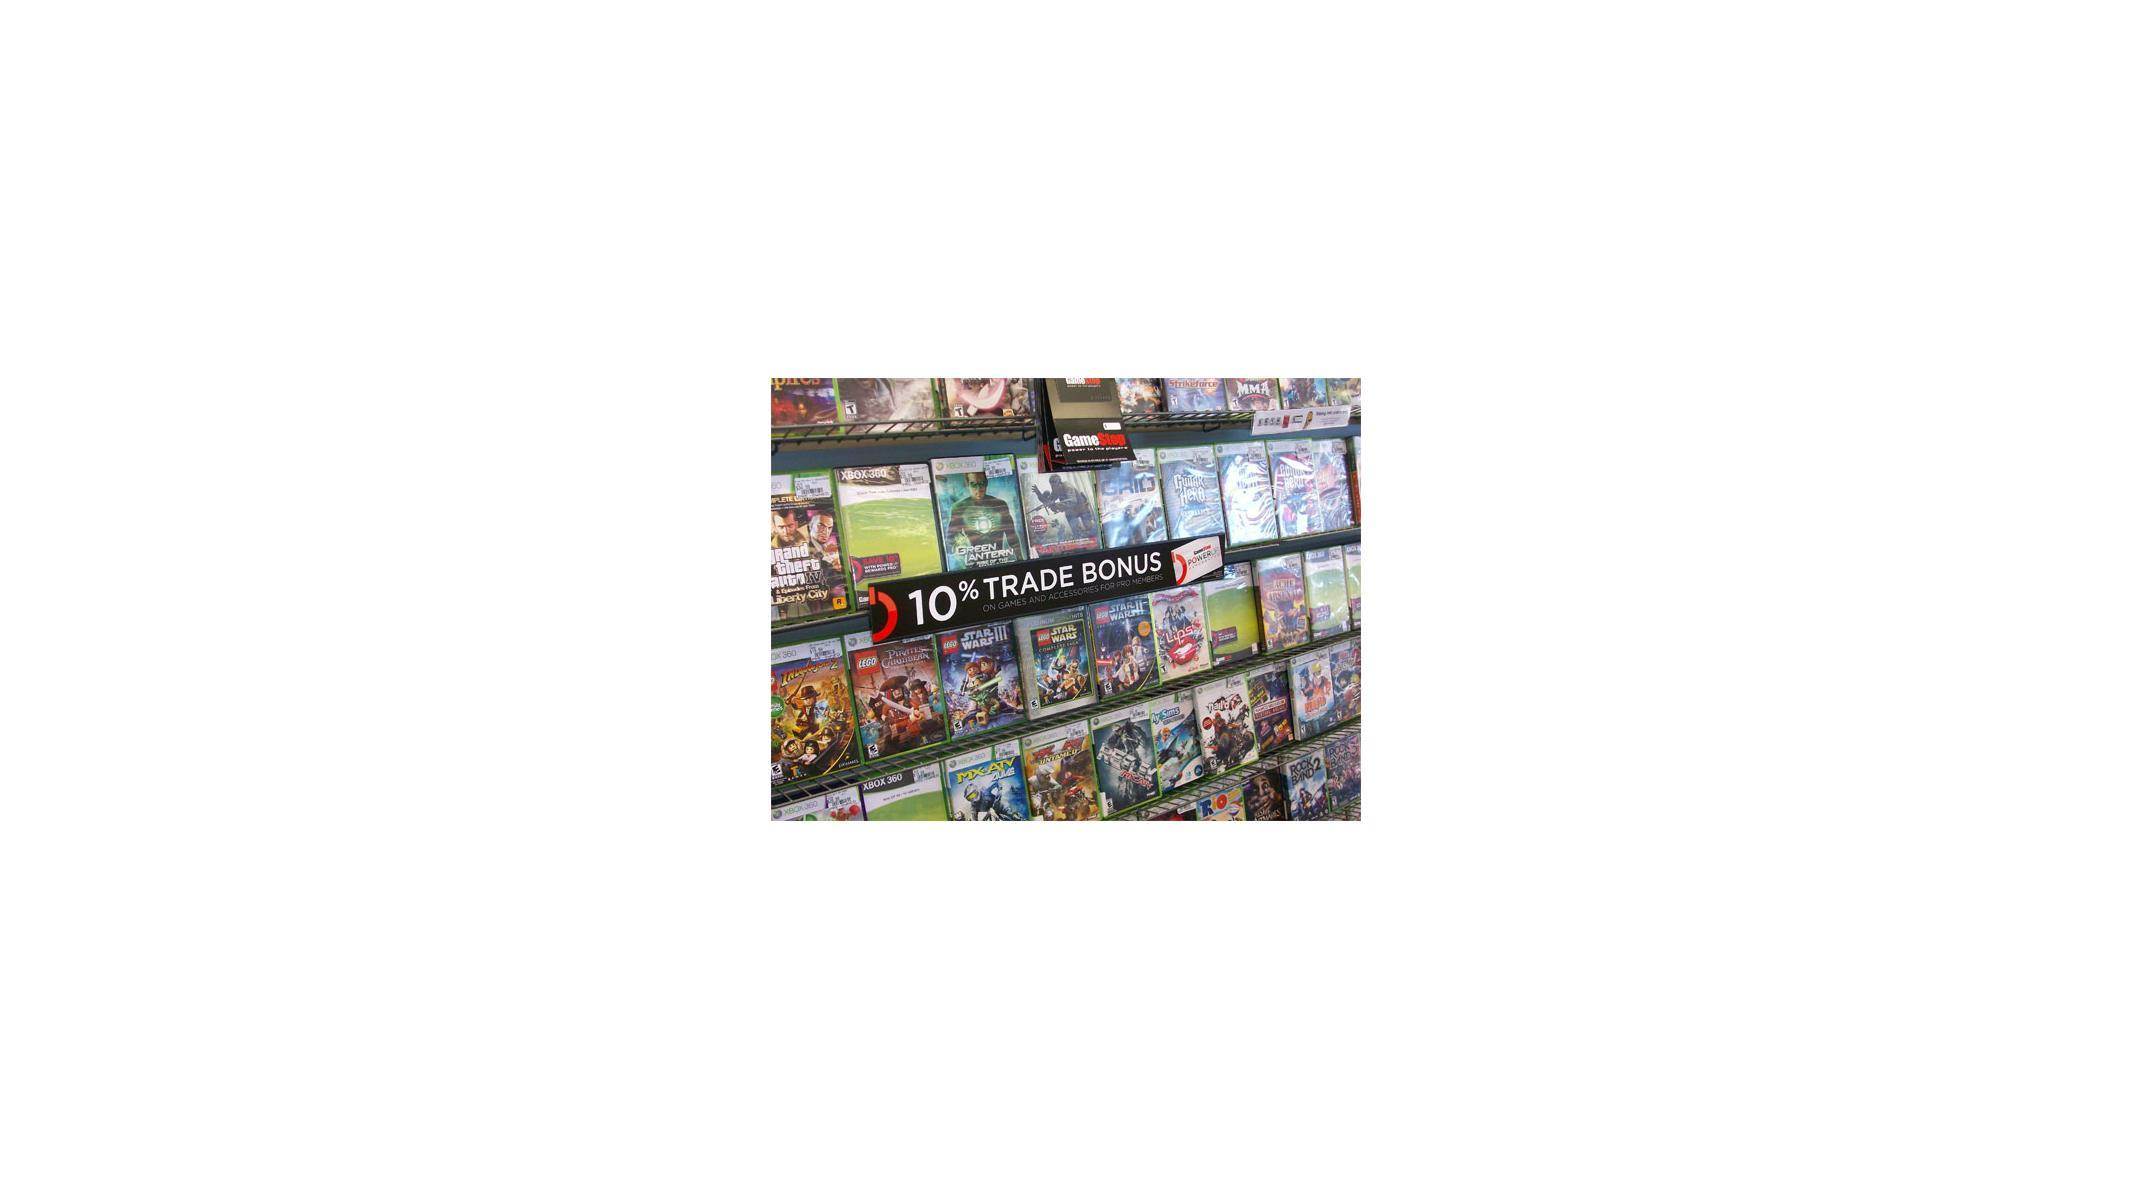 GameStop Closing 250 Unprofitable Stores, Opening 60 New